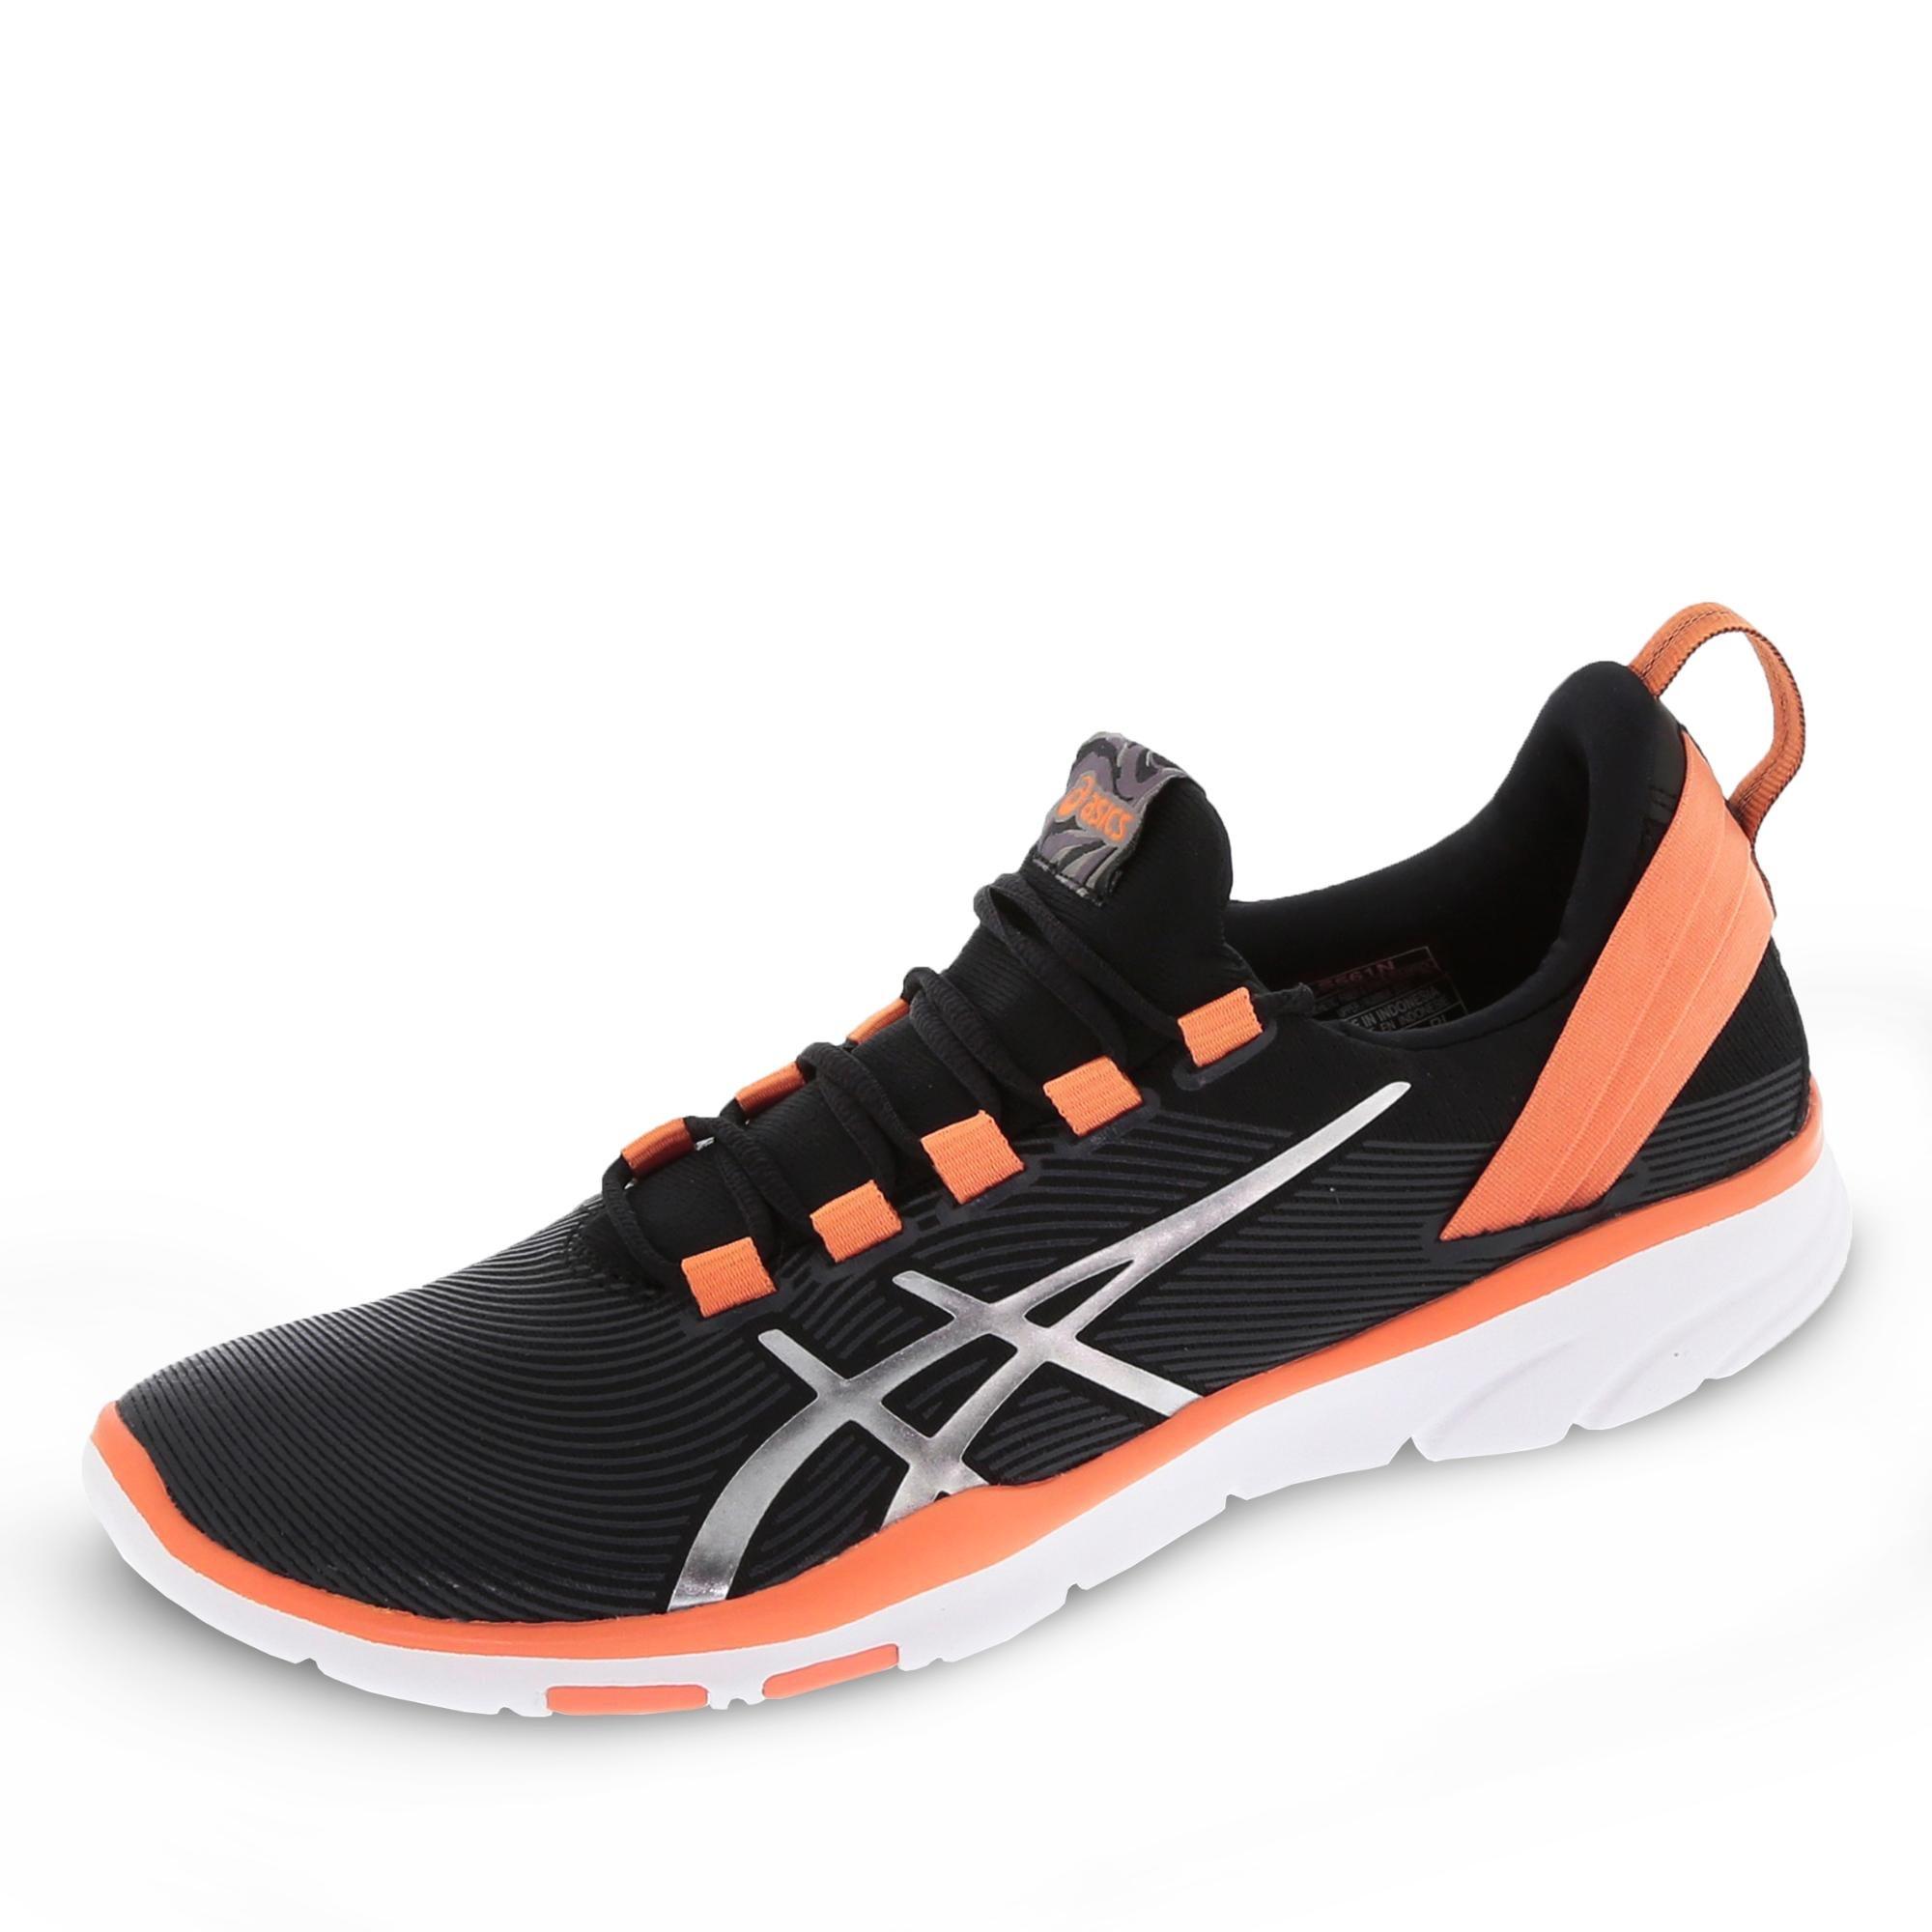 ASICS Gel-FIT Sana 2 Women's Running Shoes